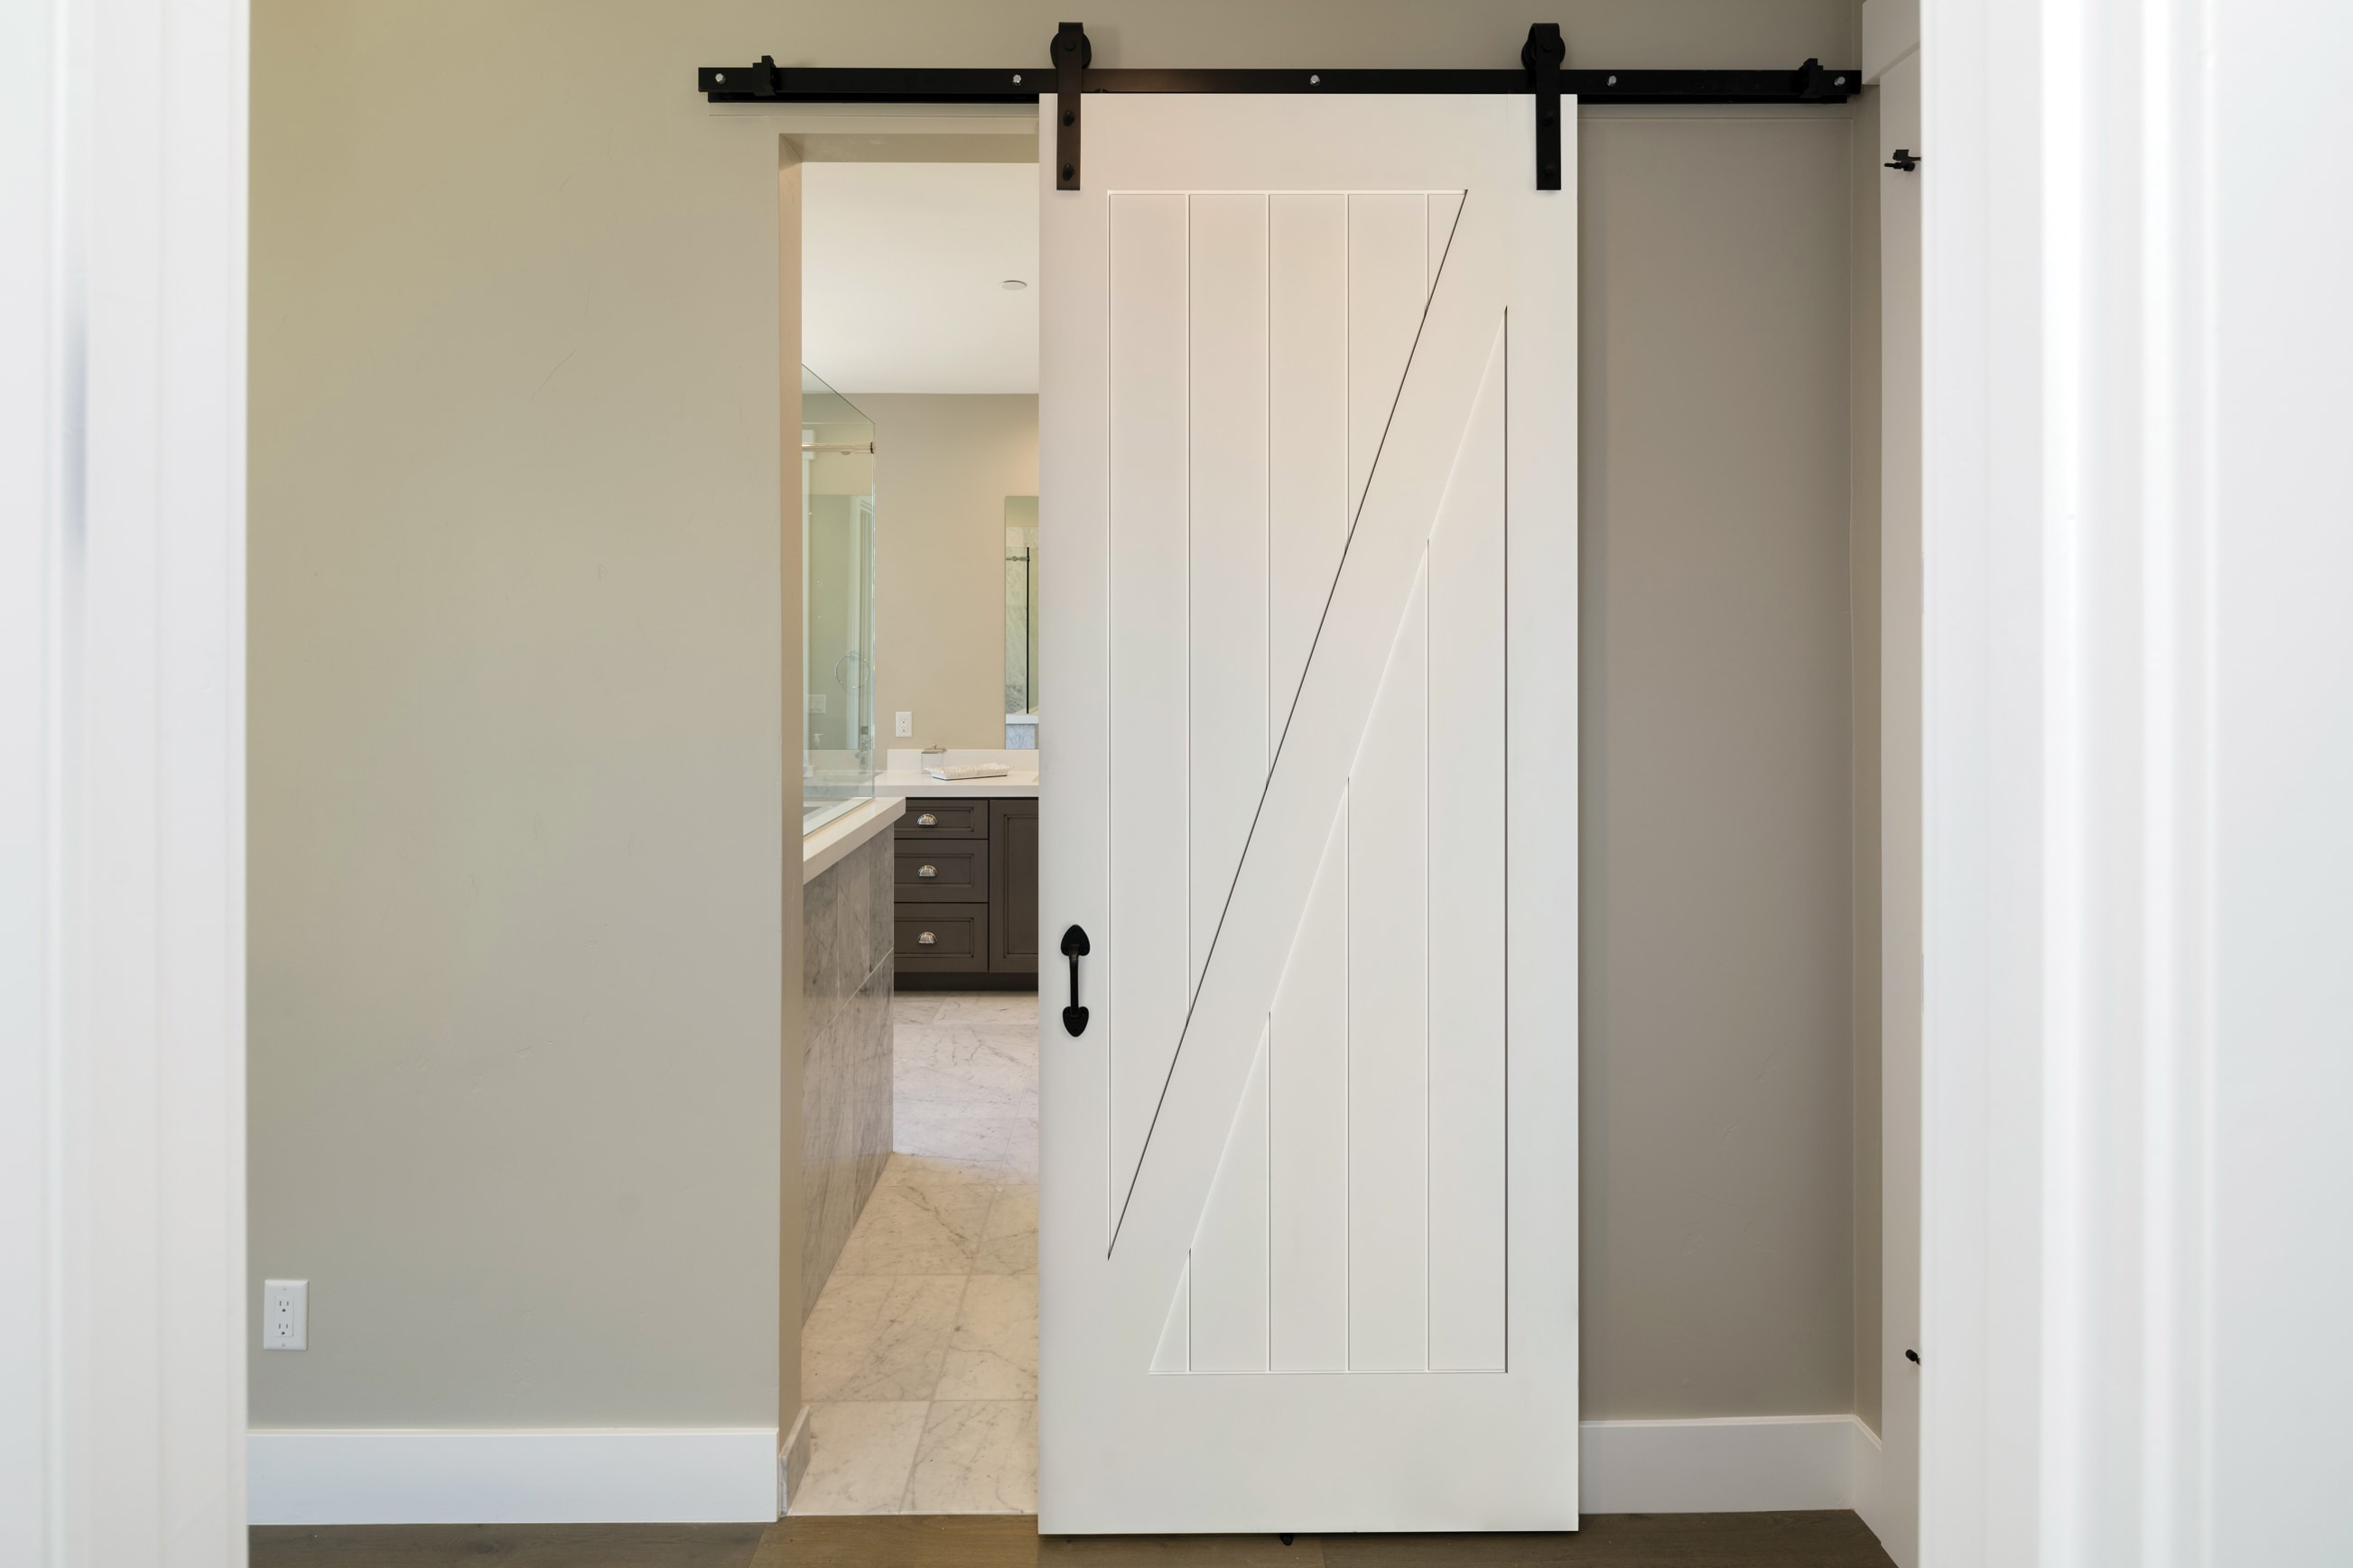 doors diff porte exterior hybrid hybride noblesse en portatec interior int design alpha look door personalized custom panels